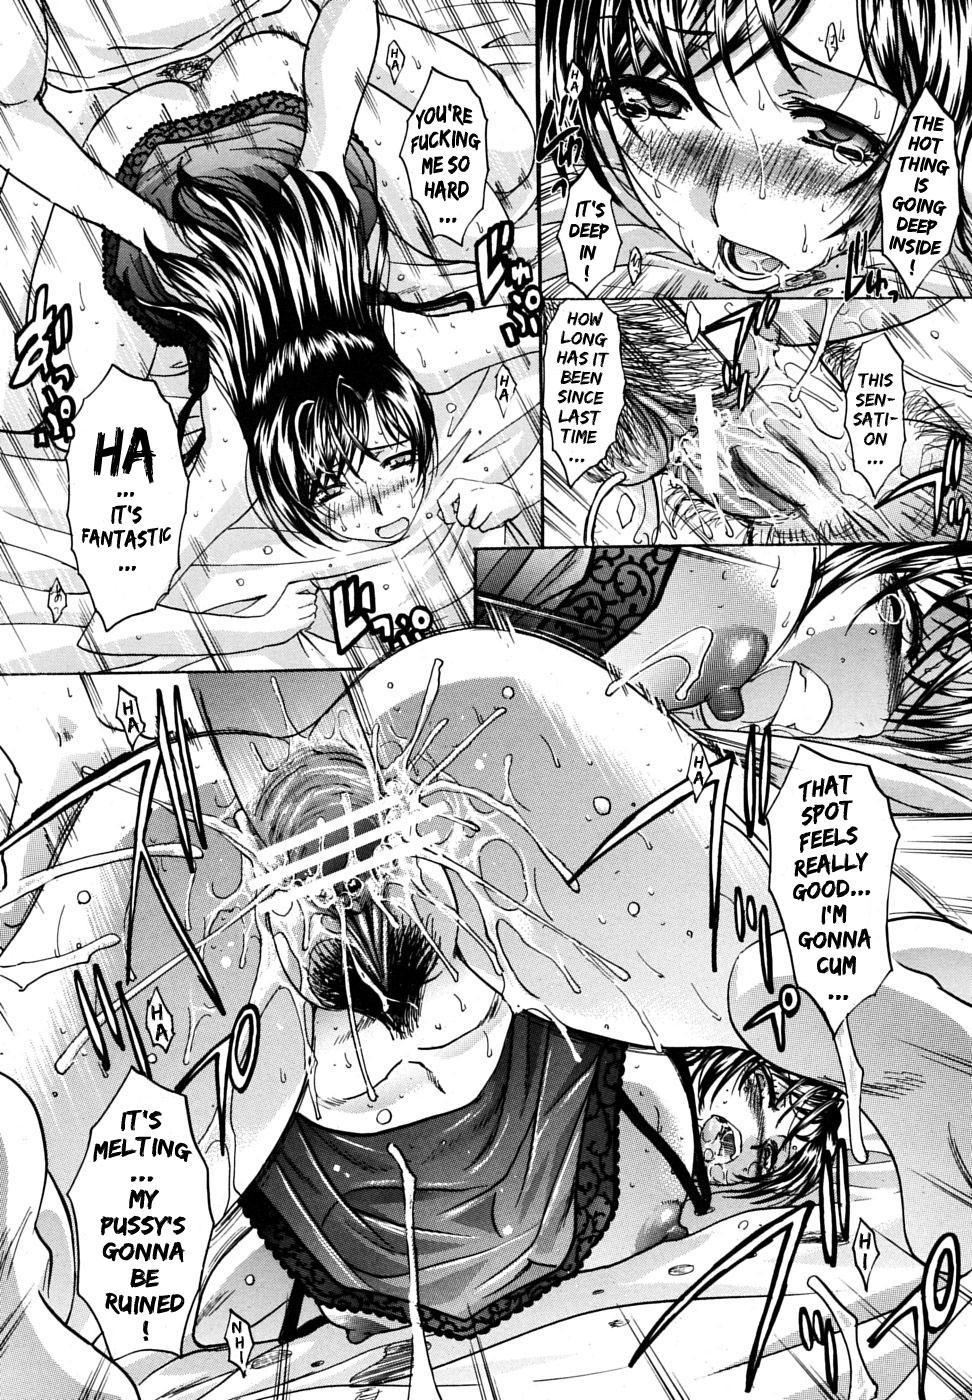 Mesu Oba Misao Arc plus Gaiden 20